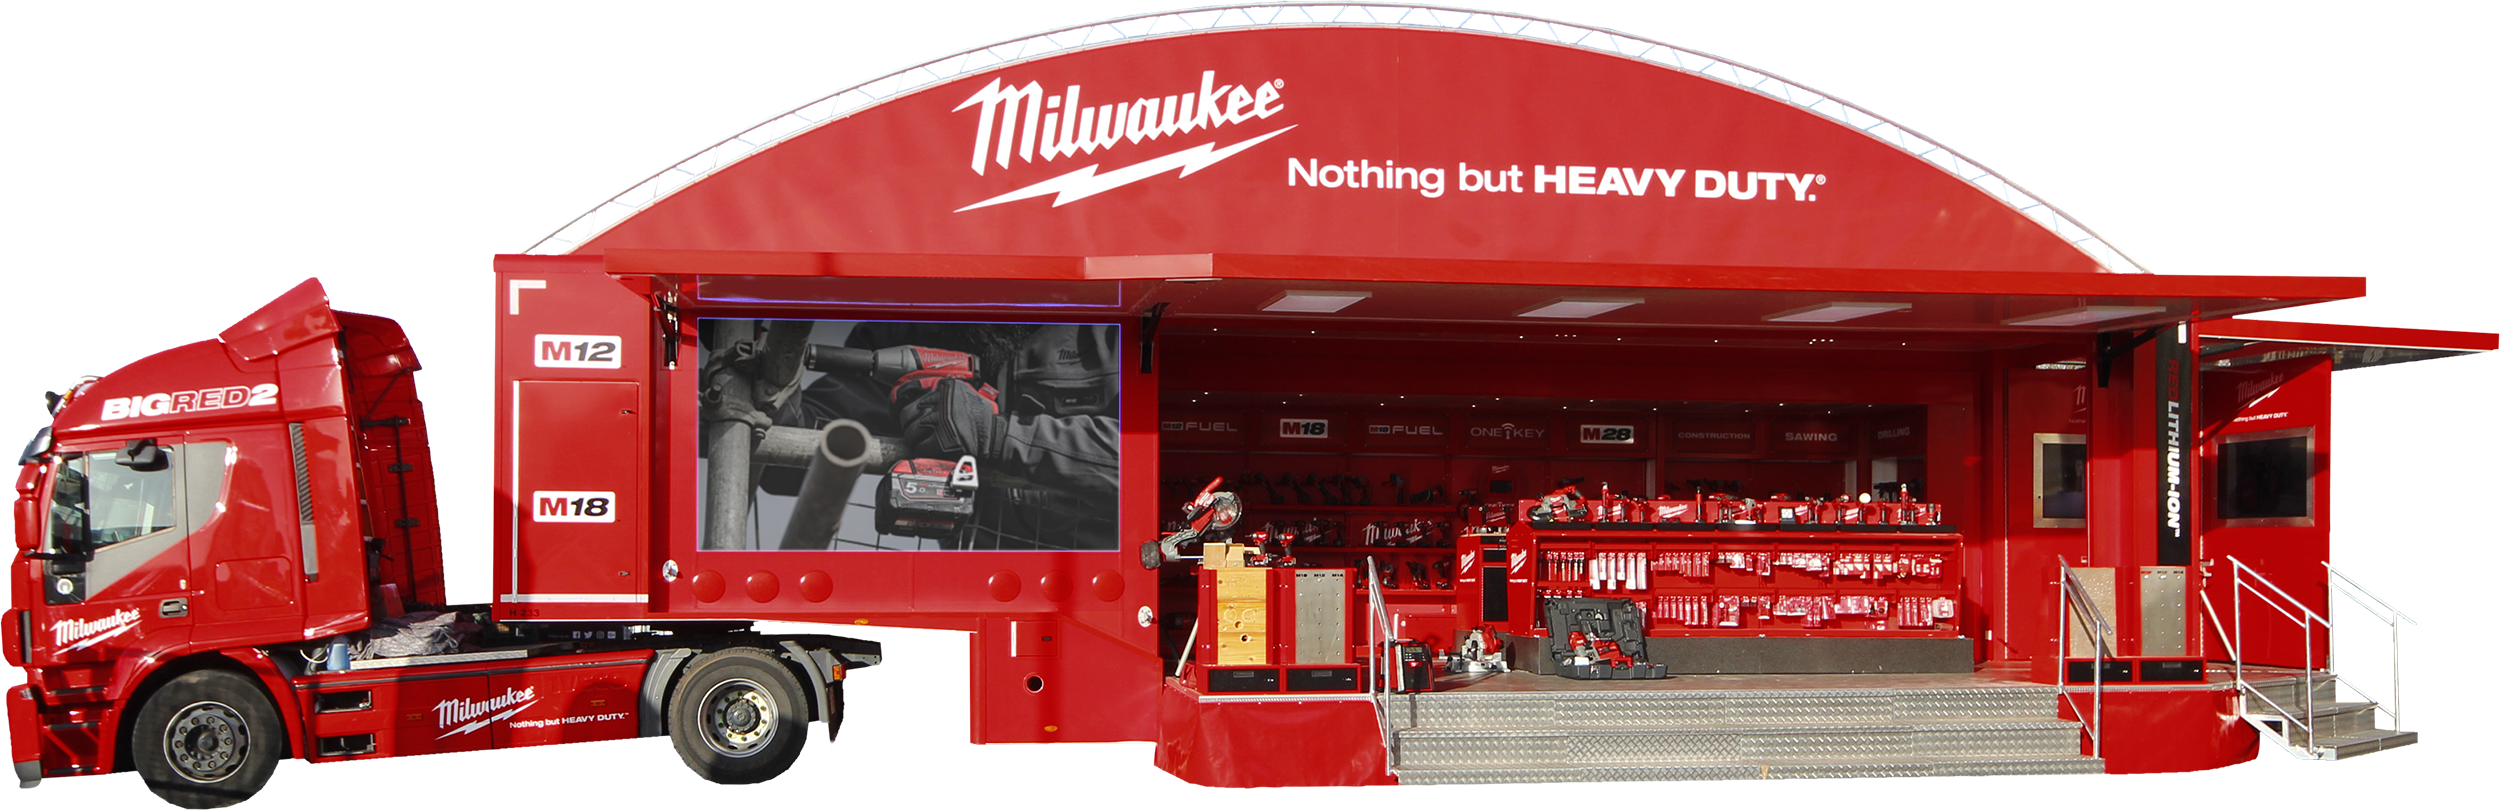 Milwaukee BIG RED TRUCK event